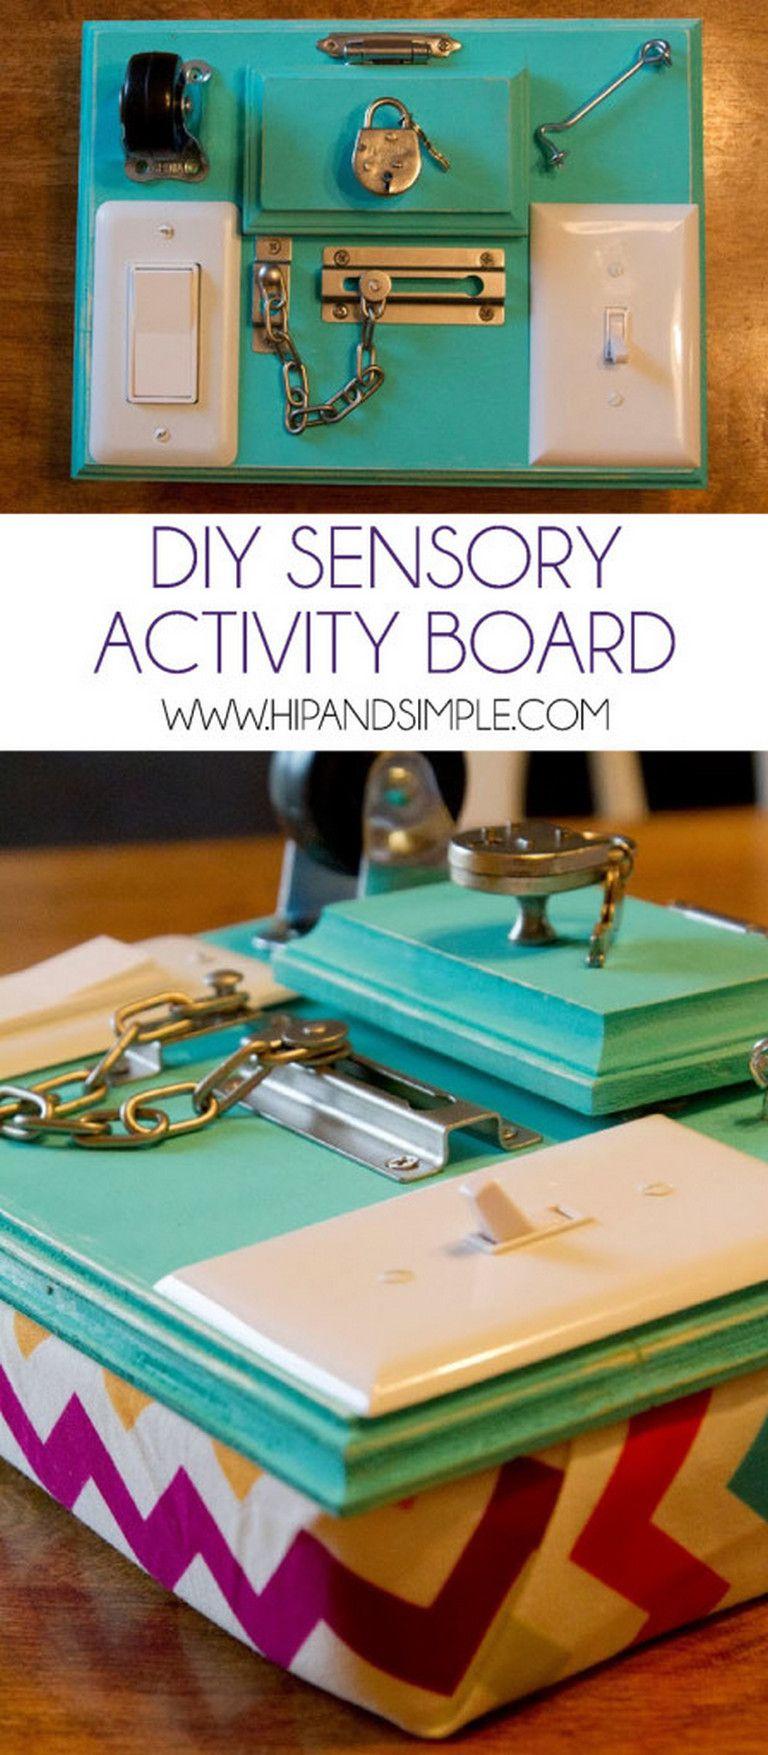 7 diy fidget toys fun activity board sensory crafts